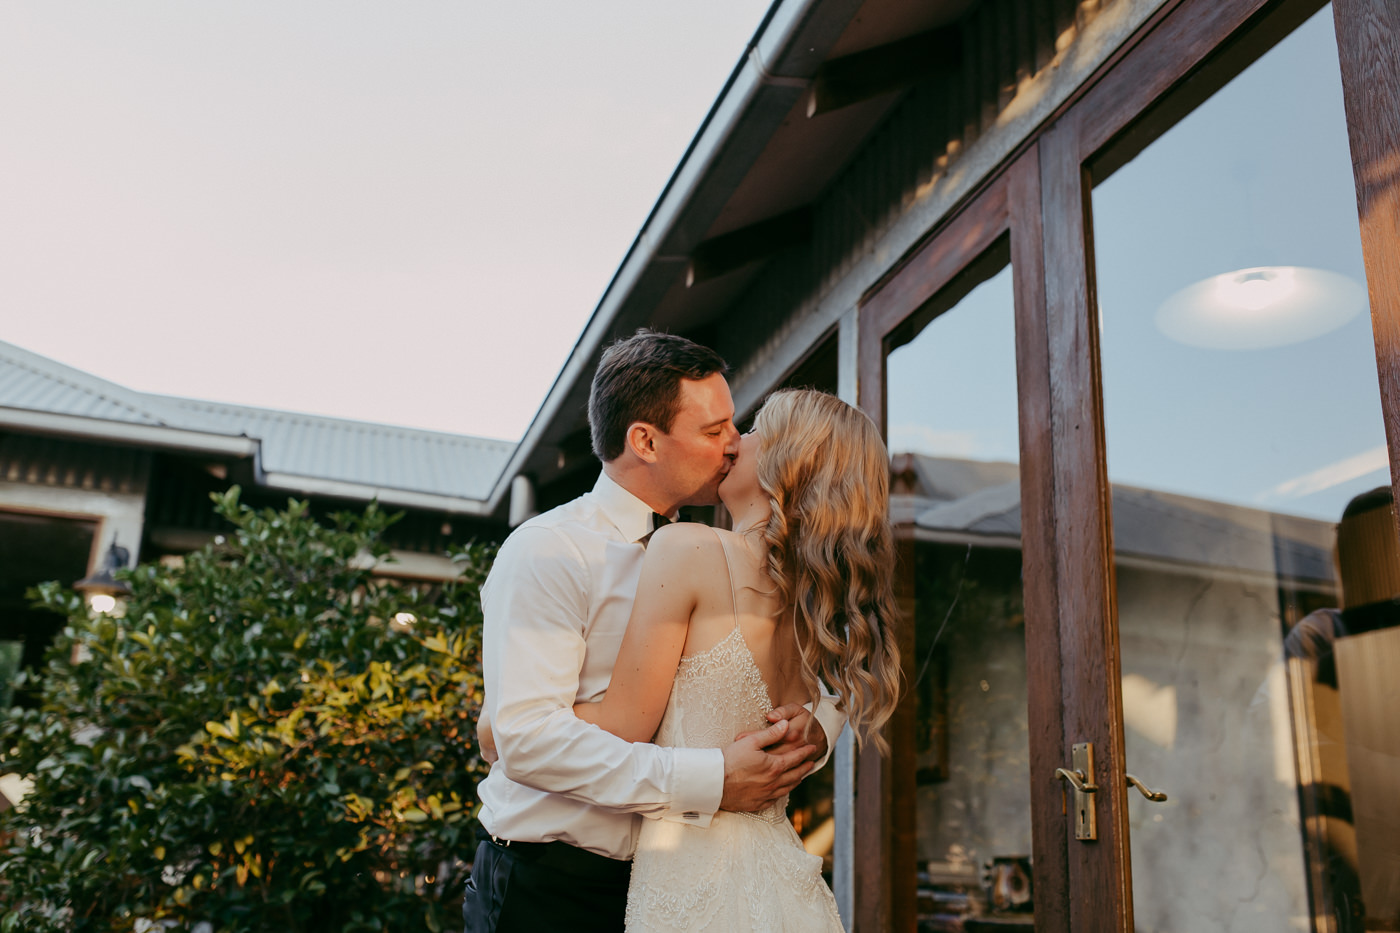 Anthony & Eliet - Wagga Wagga Wedding - Country NSW - Samantha Heather Photography-147.jpg